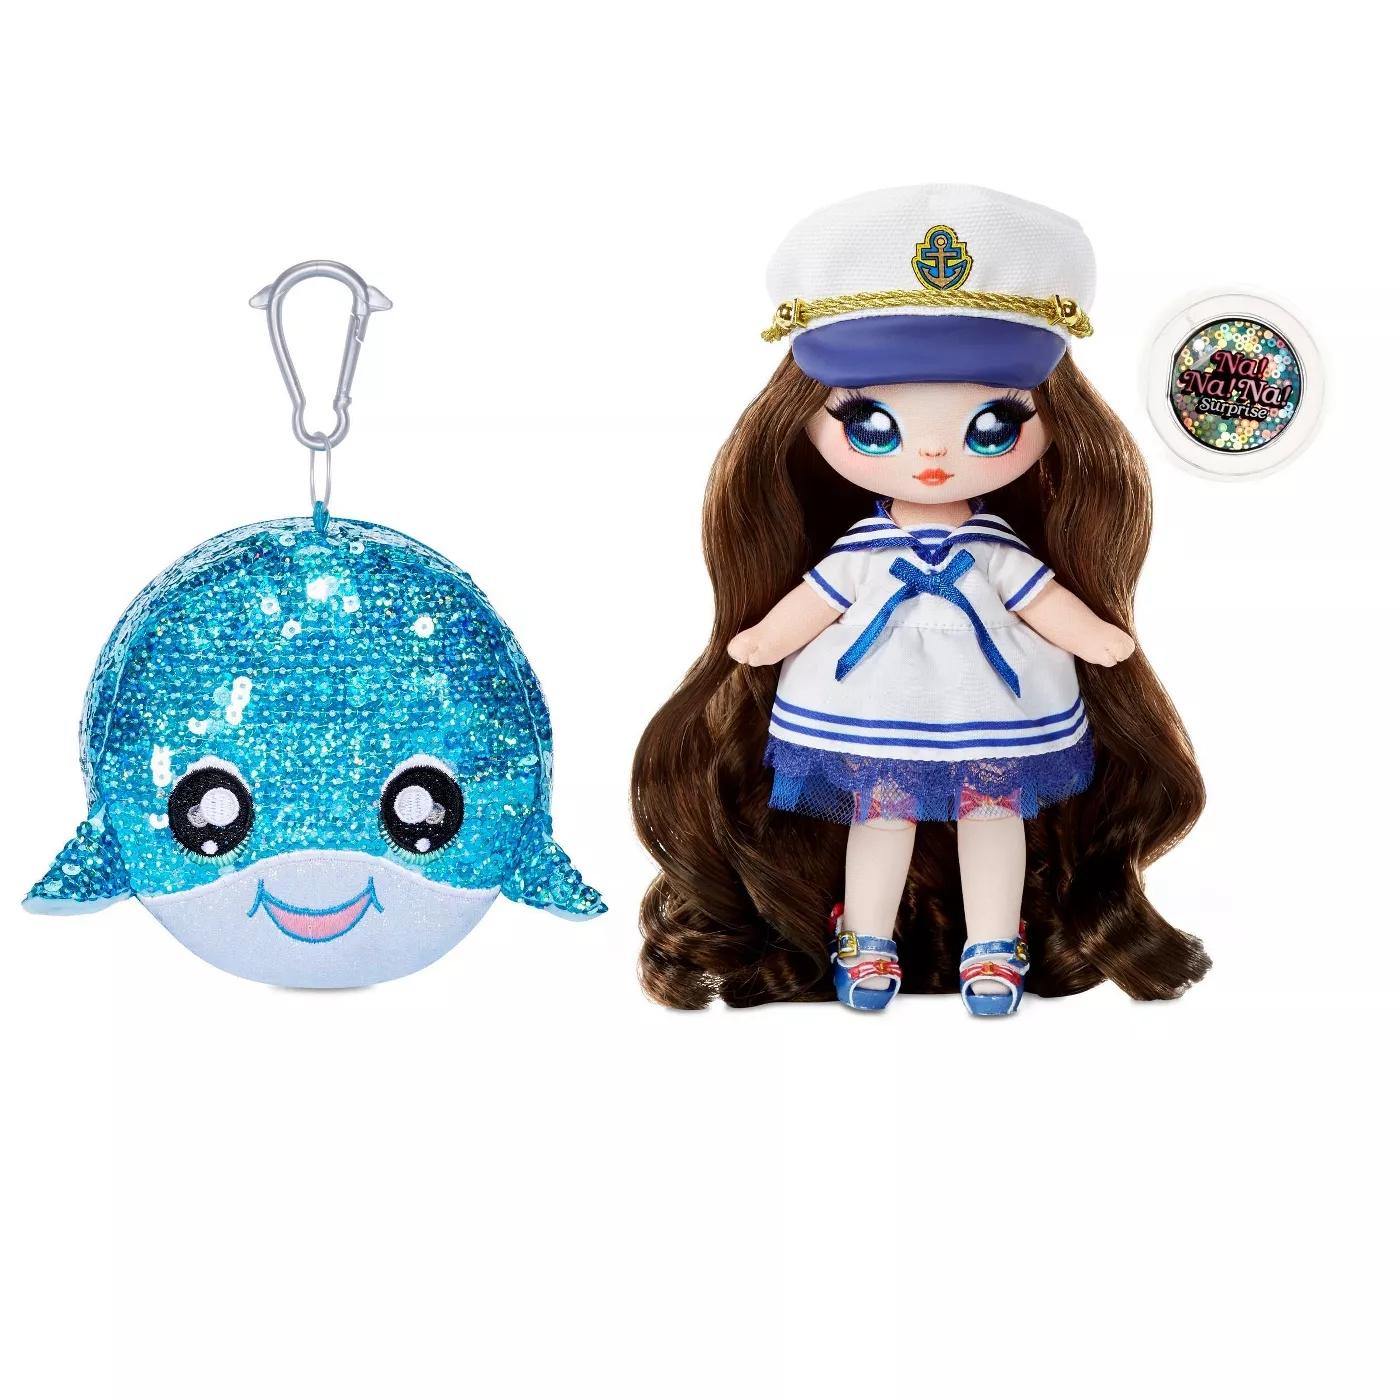 Na! Na! Na! Surprise 2w1: Sparkle Series 1 - Sailor Blu i cekinowa torebka wieloryb (572367EUC/573951)